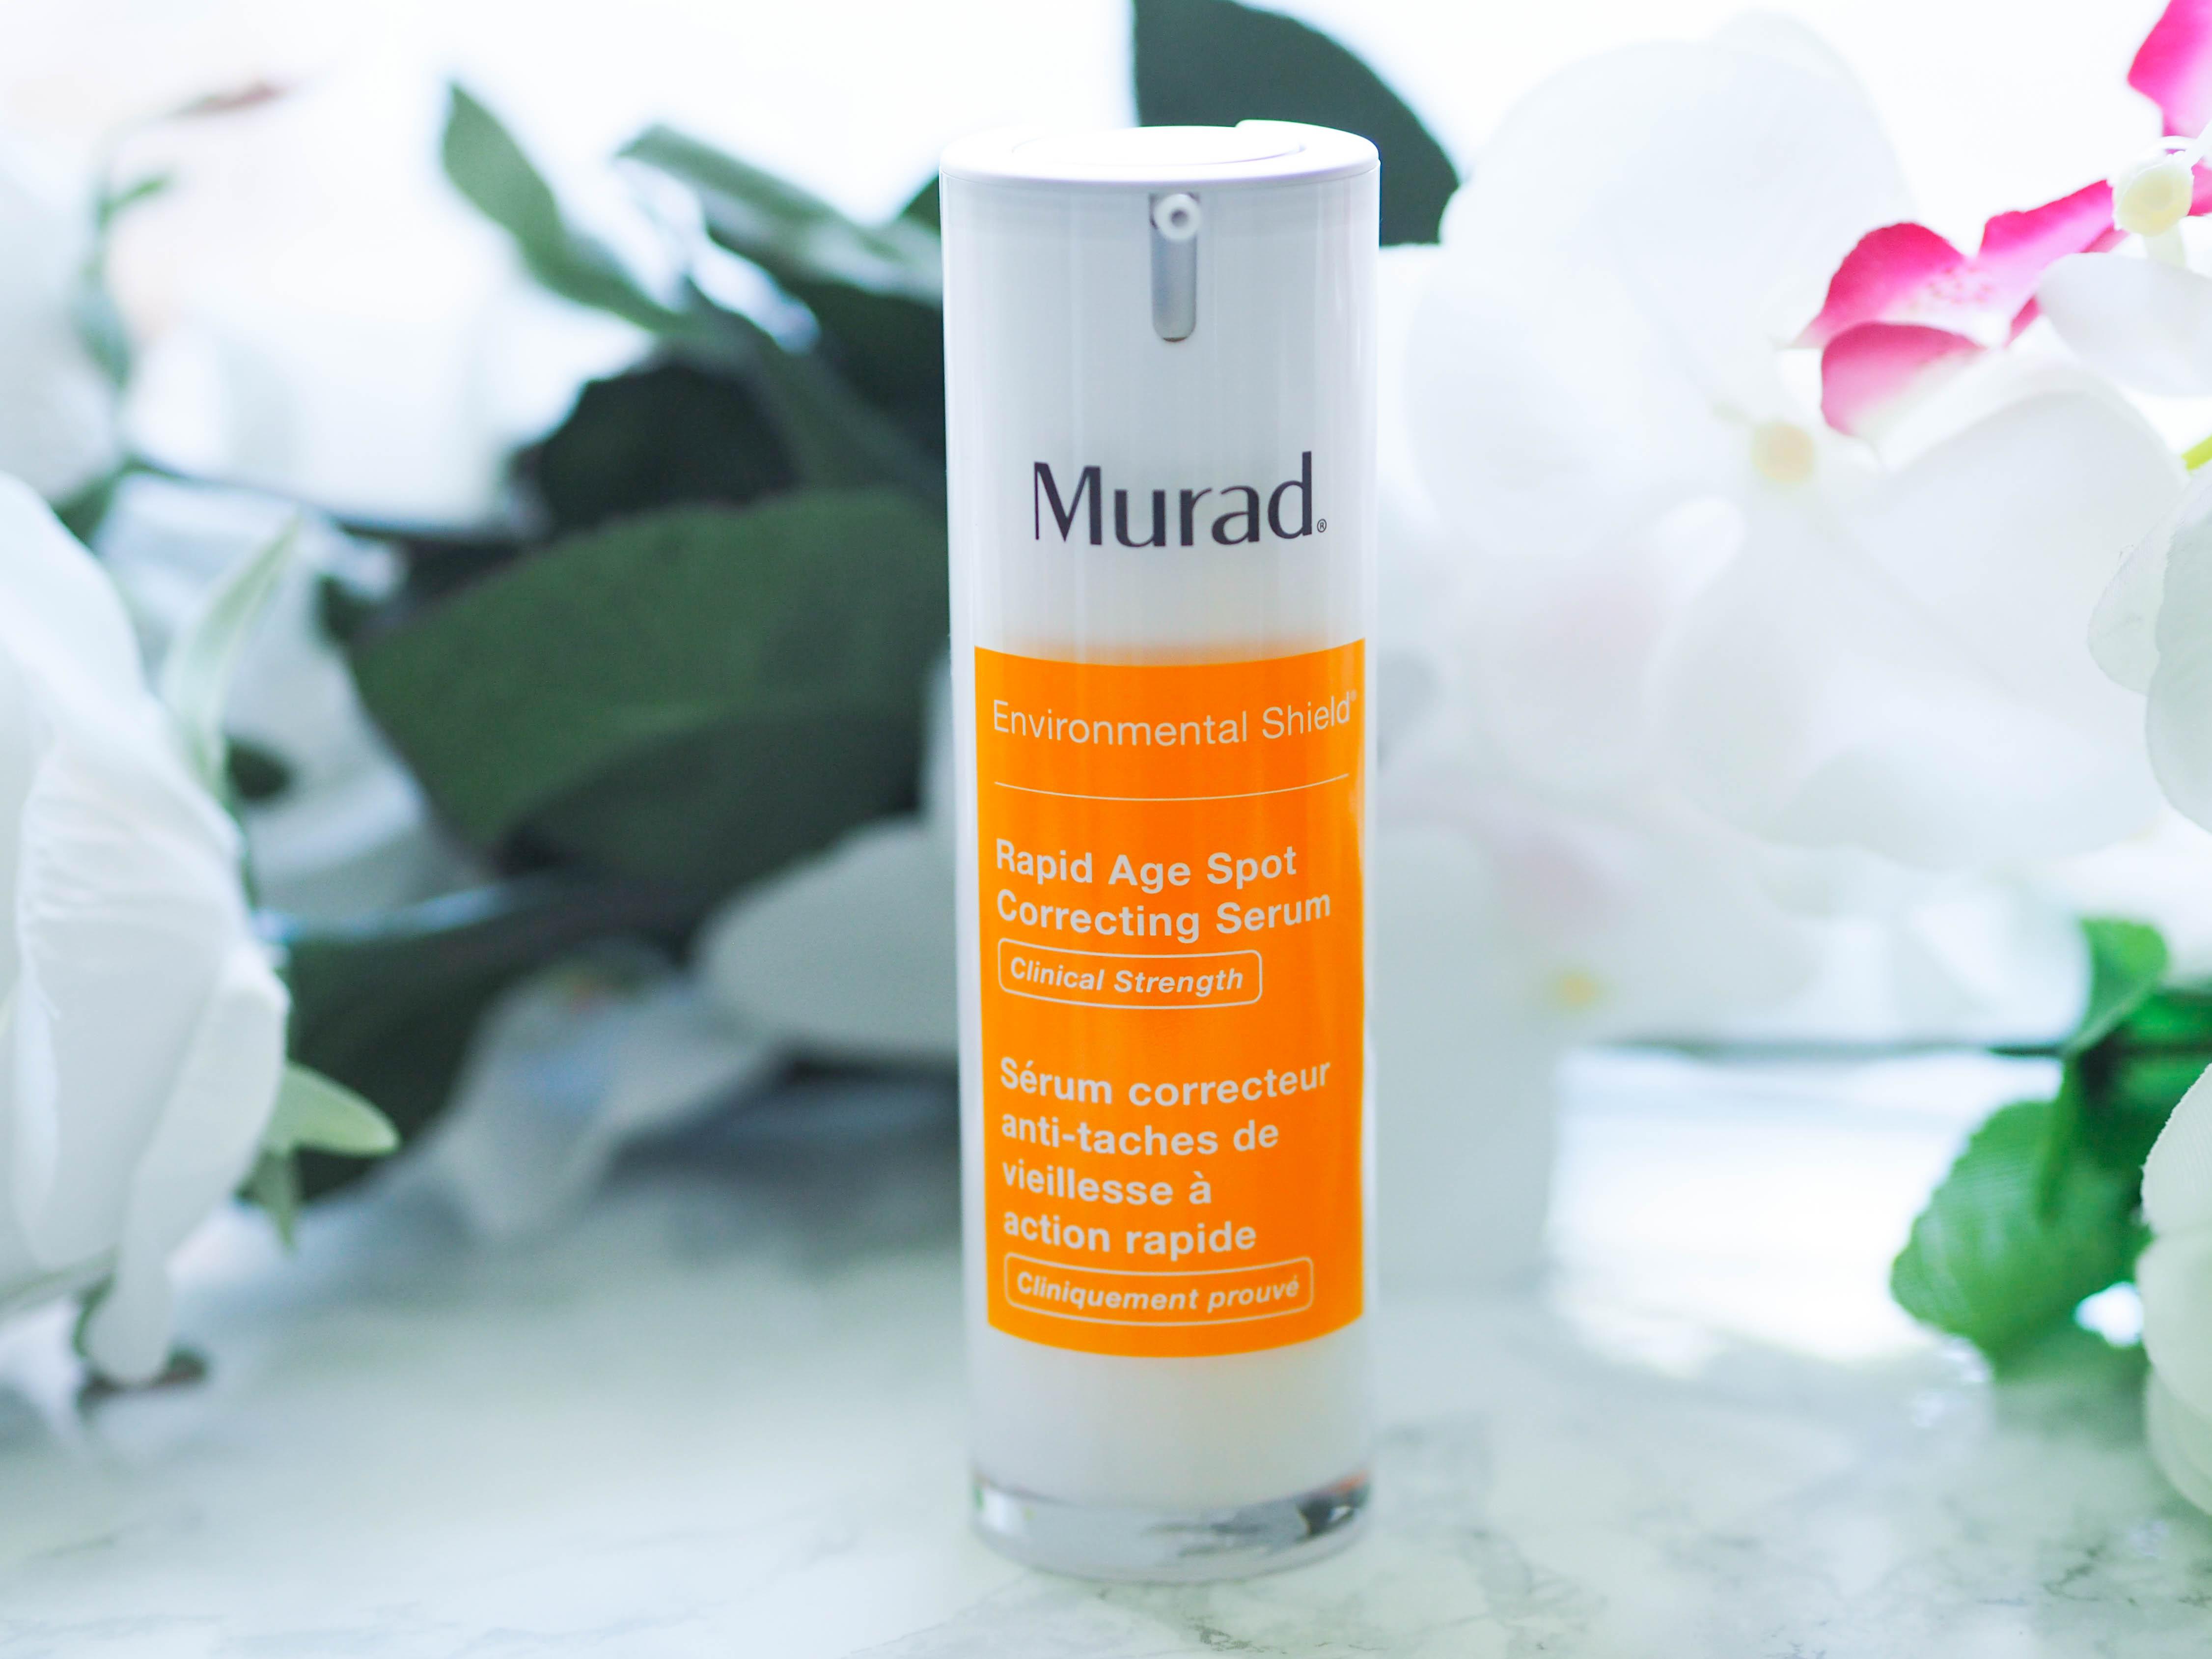 Murad Rapid Age Spot Correcting Serum